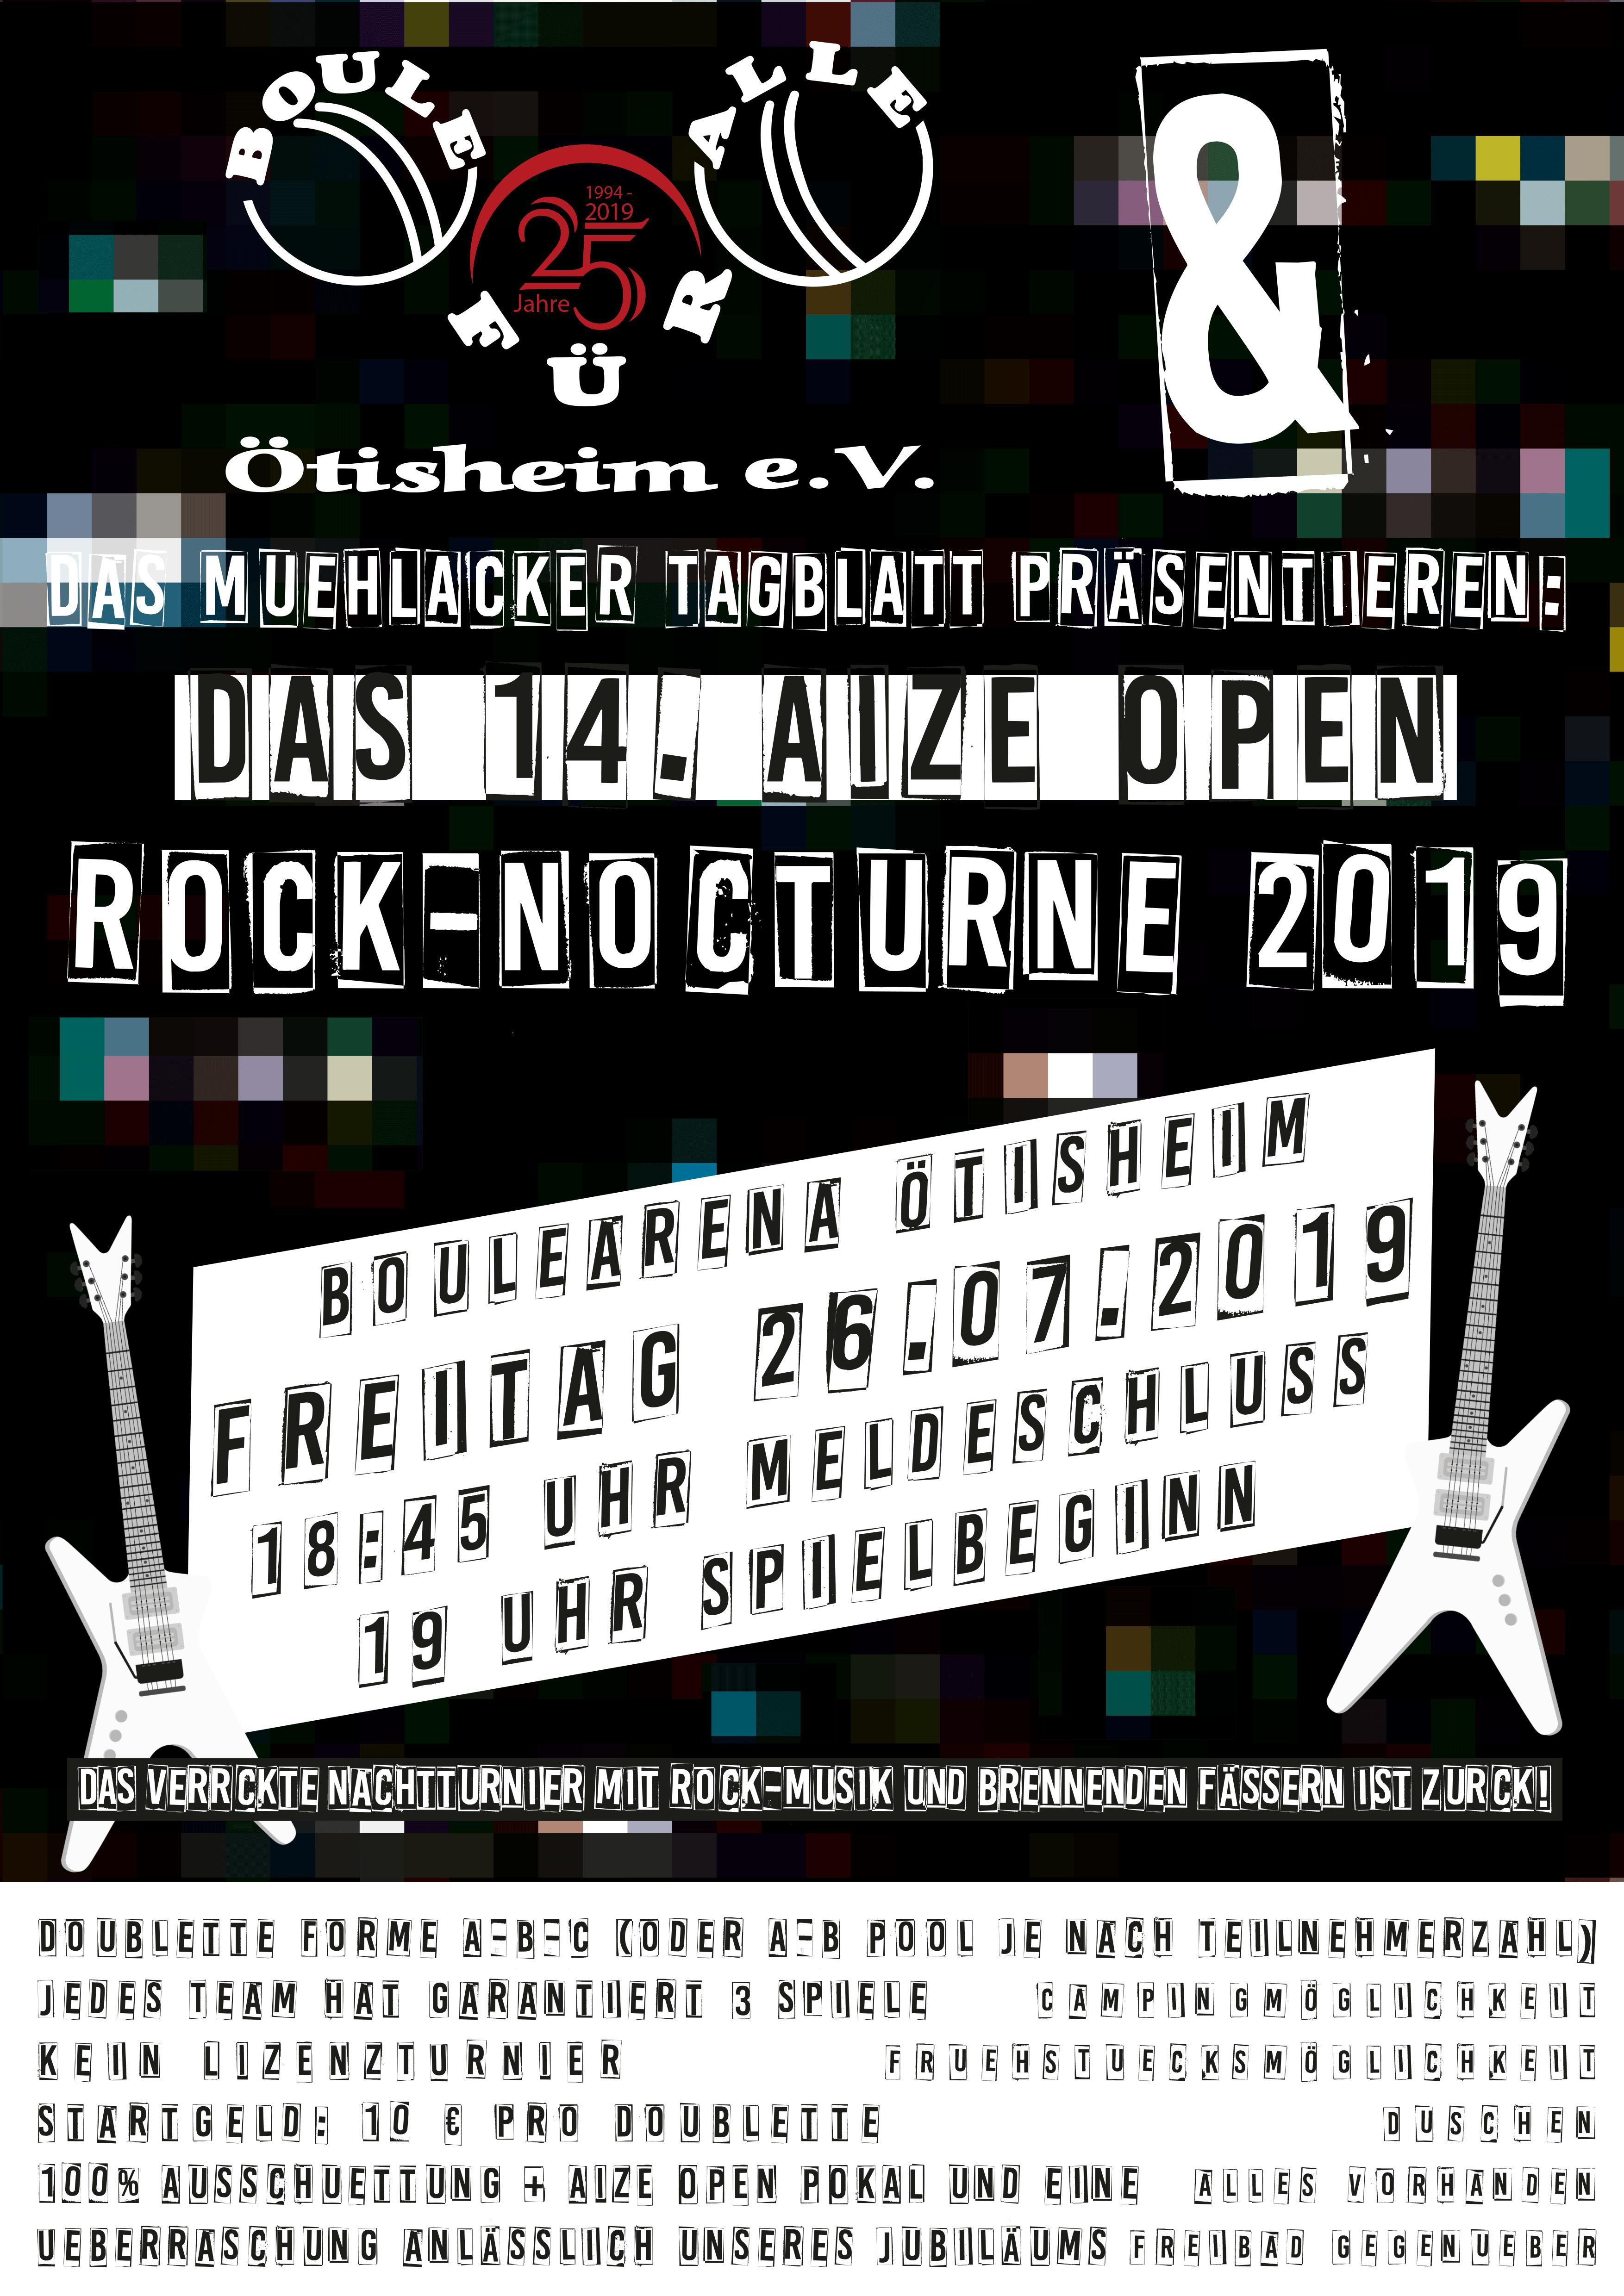 ROCK-Nocturne